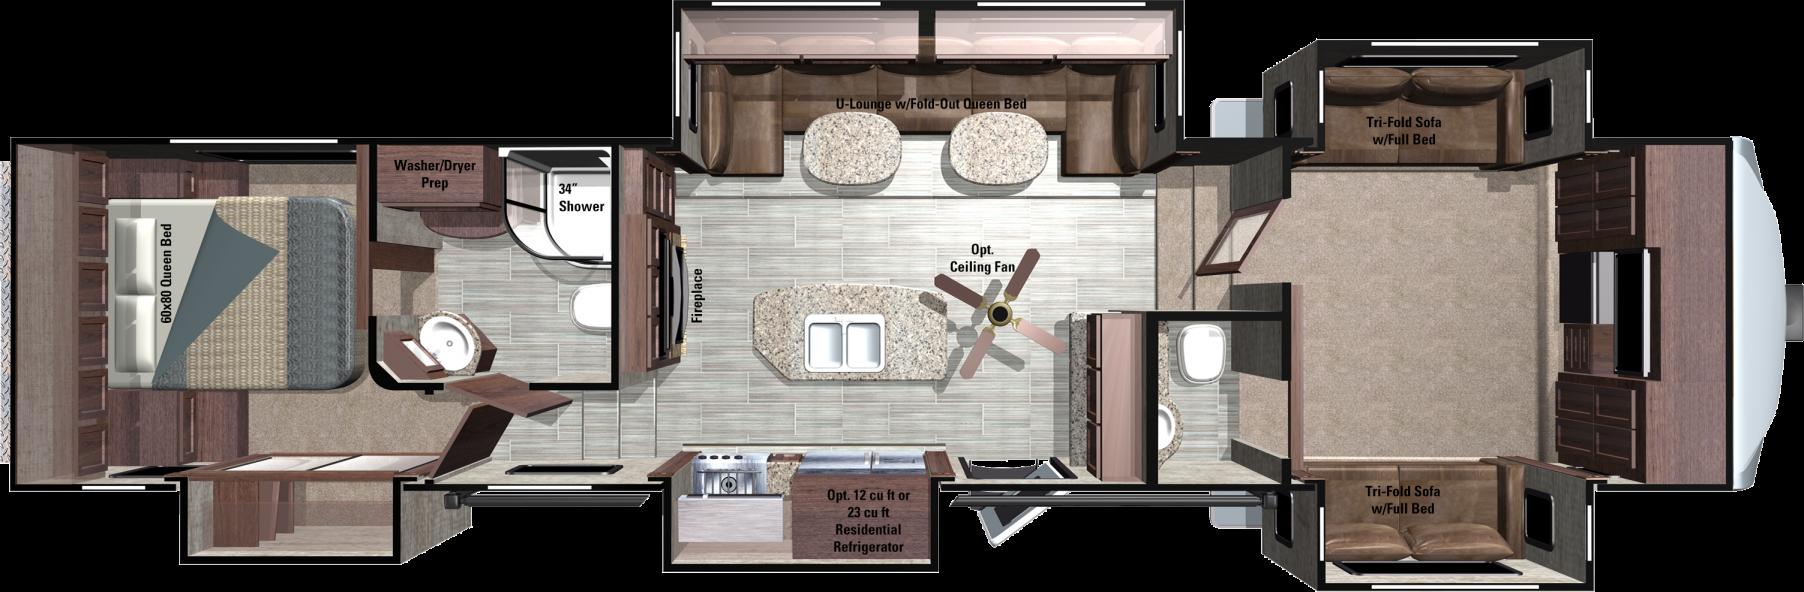 RF376FBH Floorplan